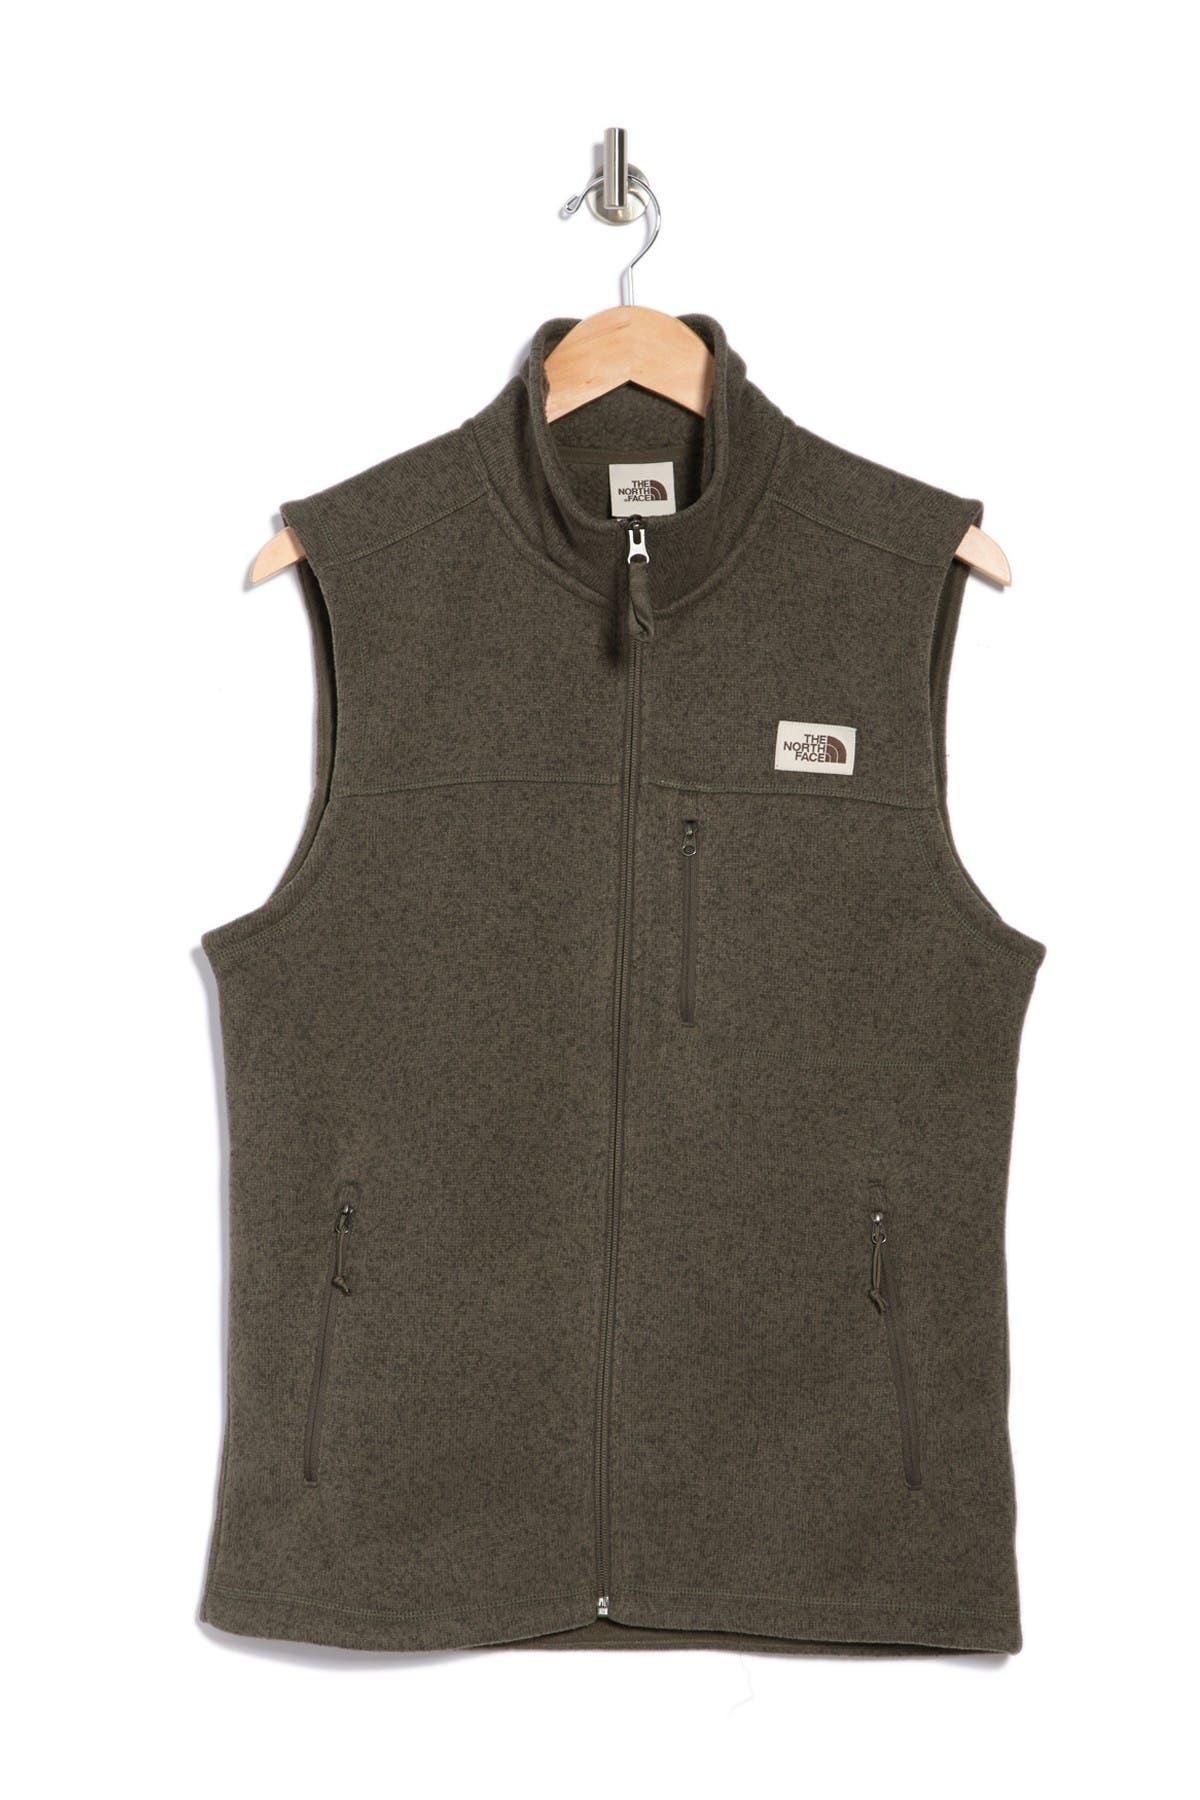 Image of The North Face Gordon Lyons Zip Vest